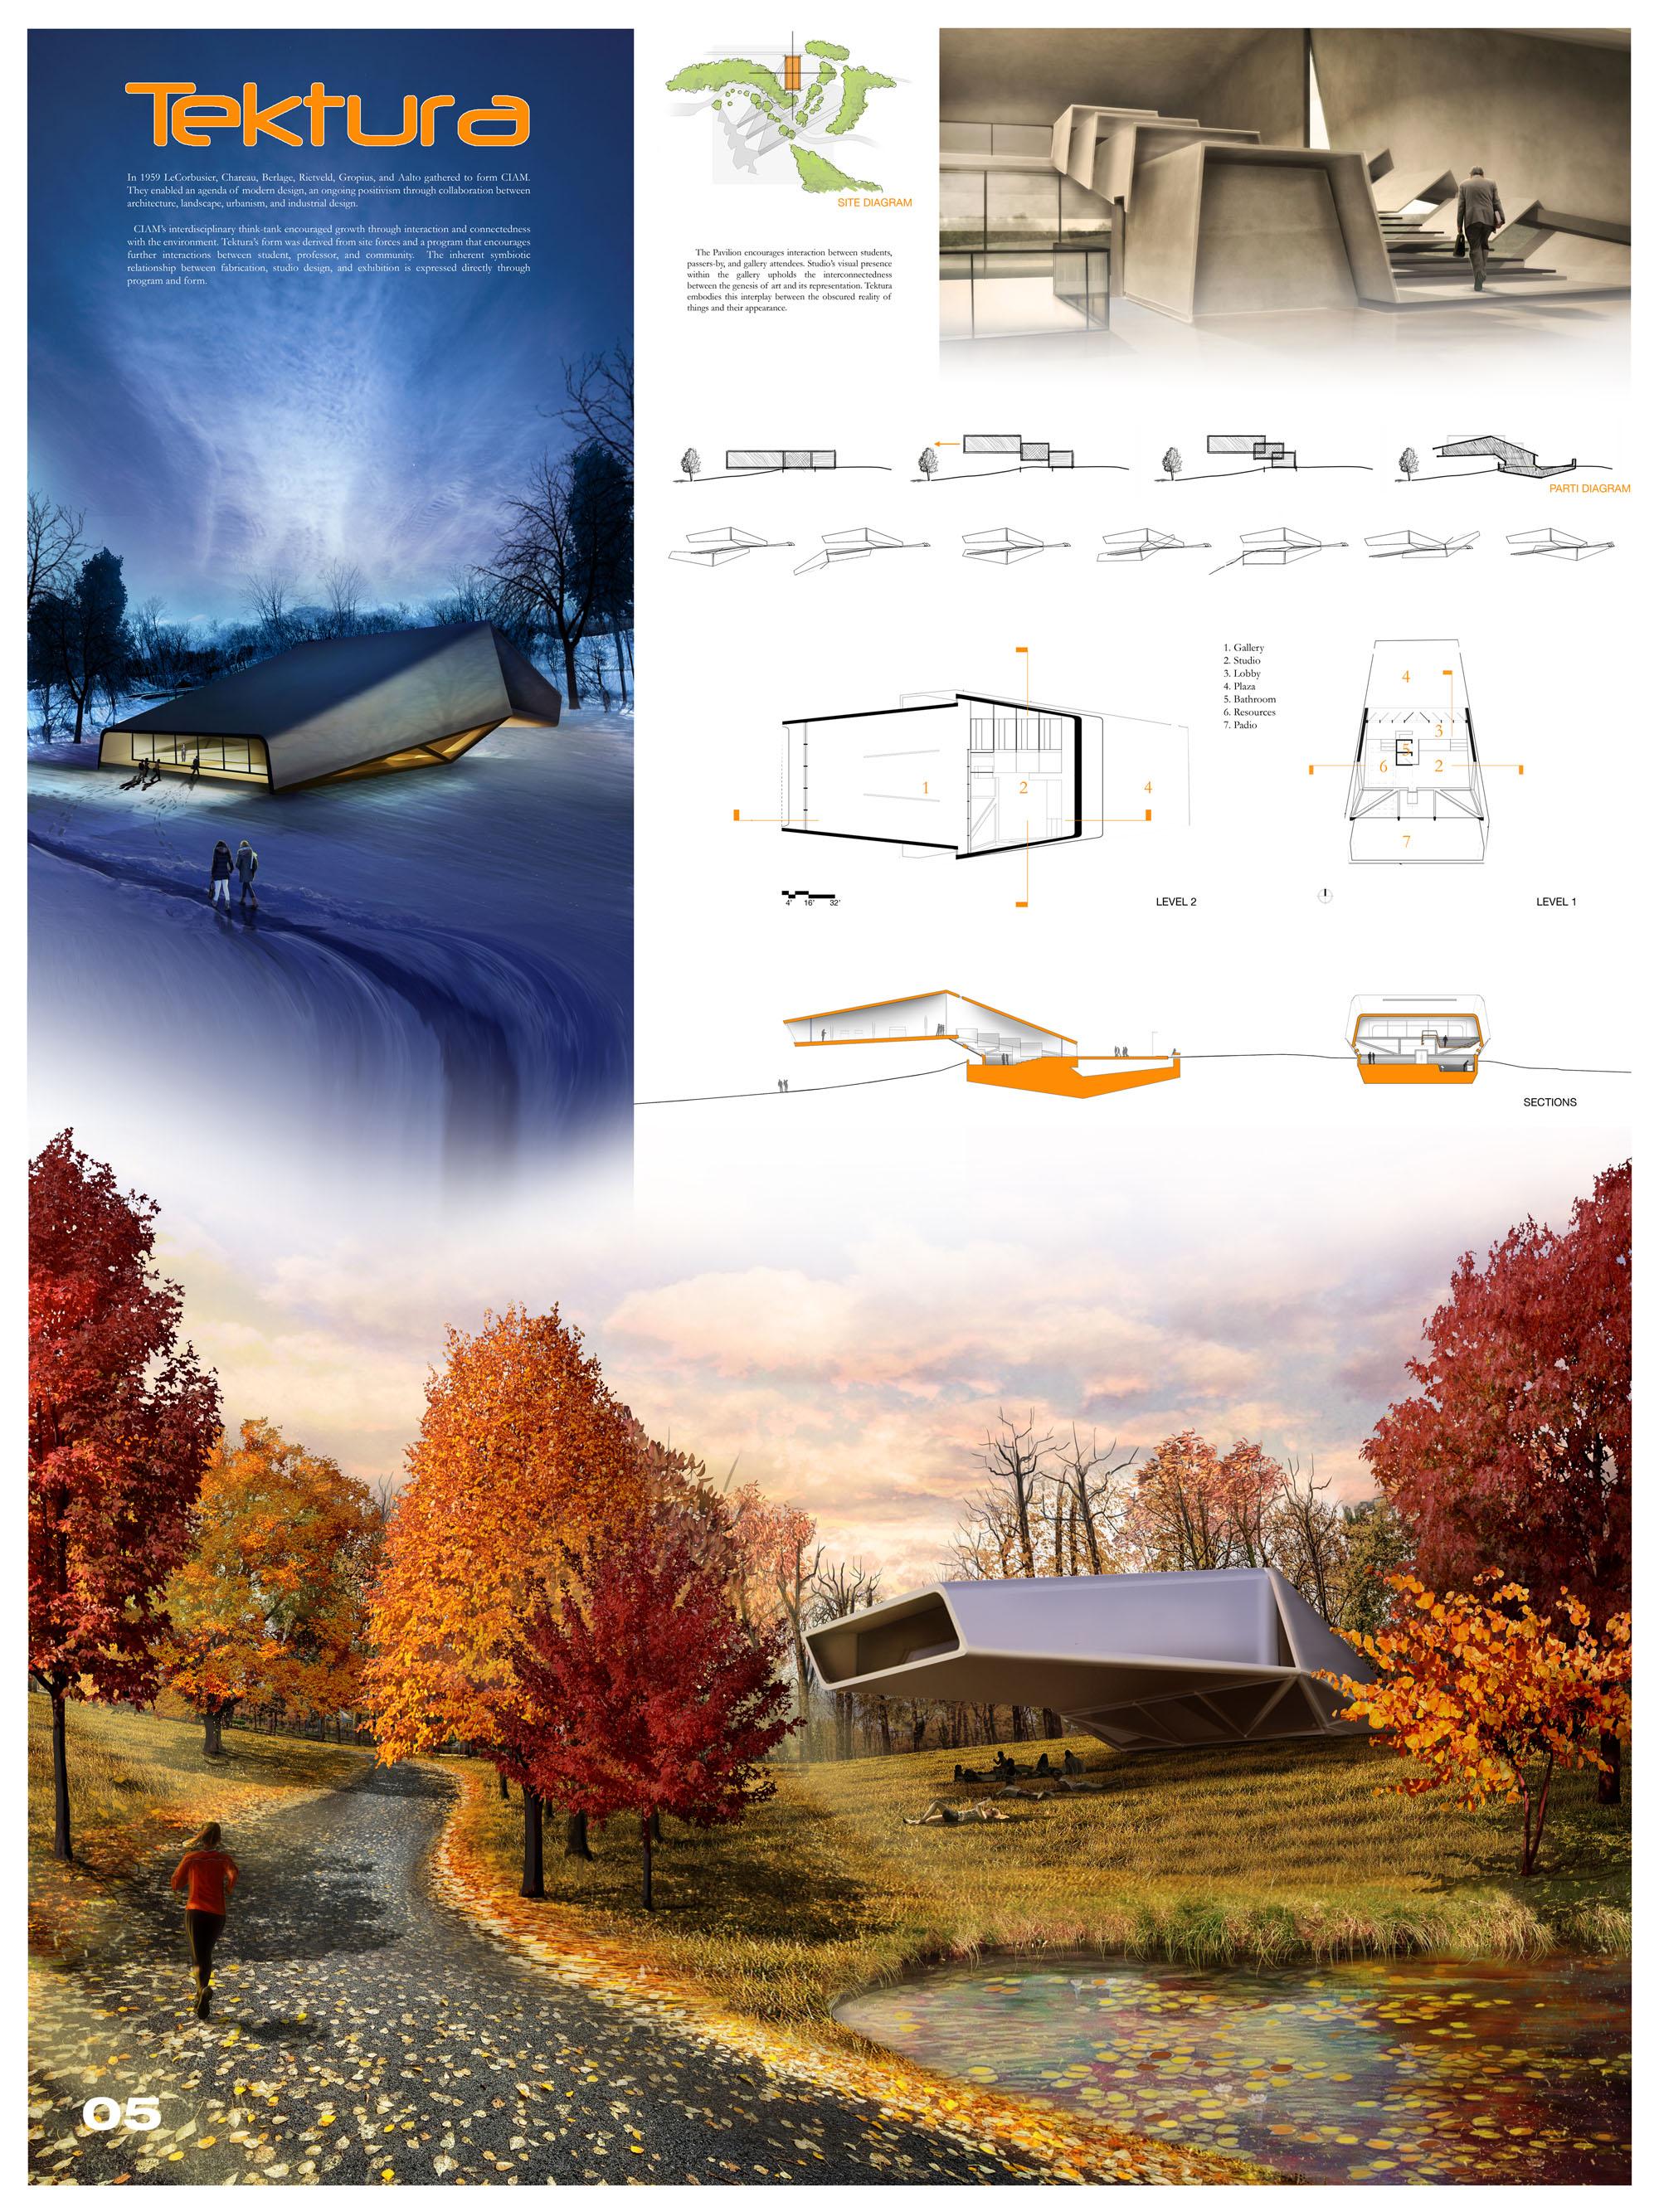 Project Collaboration: Allen Yoder, Clayton Witt, Jeff Barr